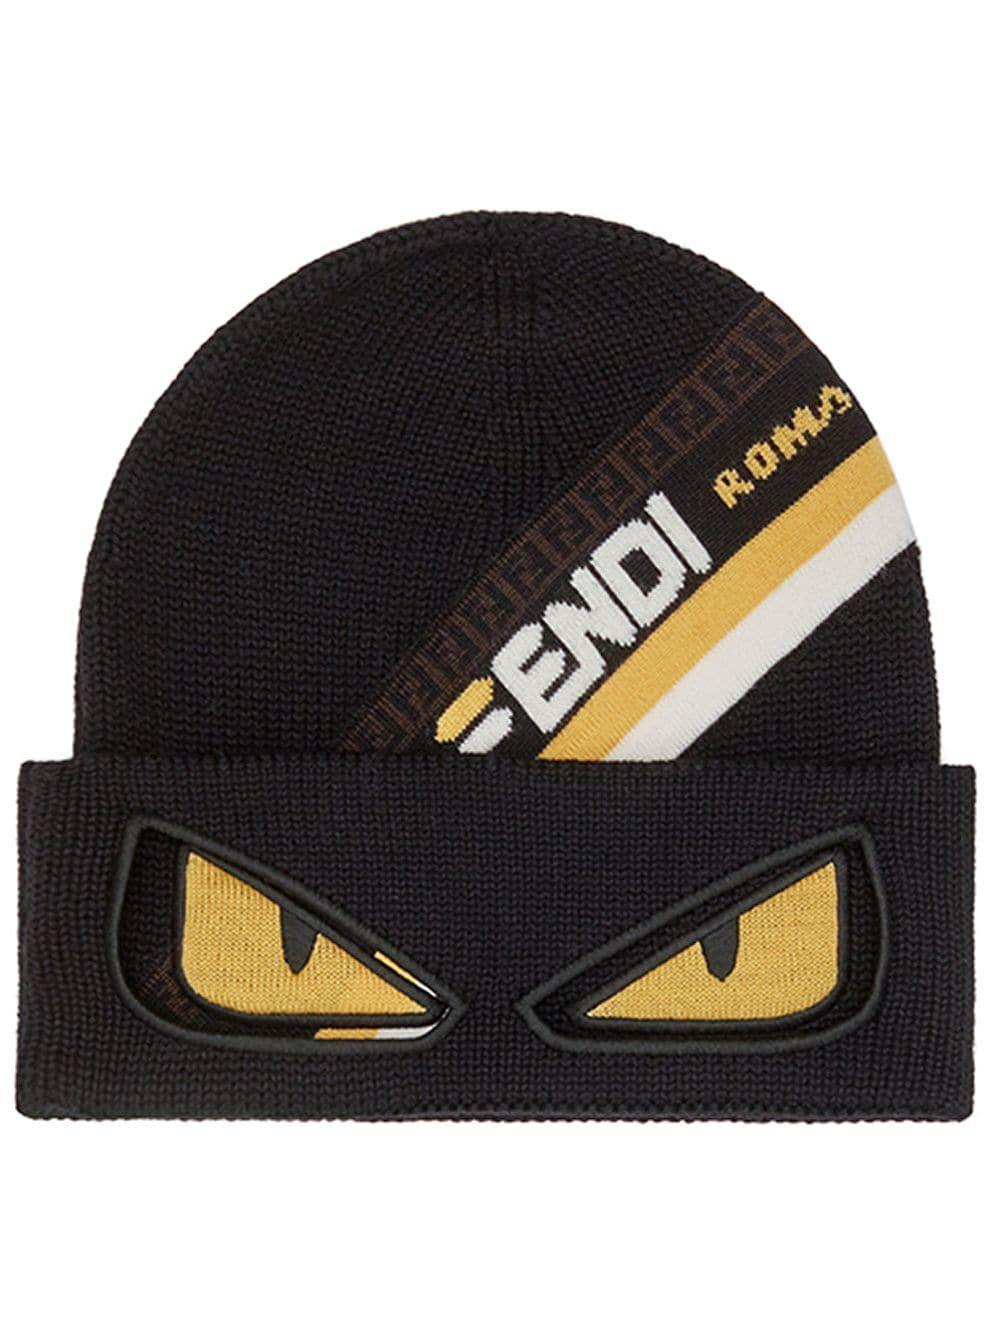 e302ec51730 FENDI FENDI FENDIMANIA BAGS BUGS HAT - BLACK. #fendi | Fendi | Bug ...